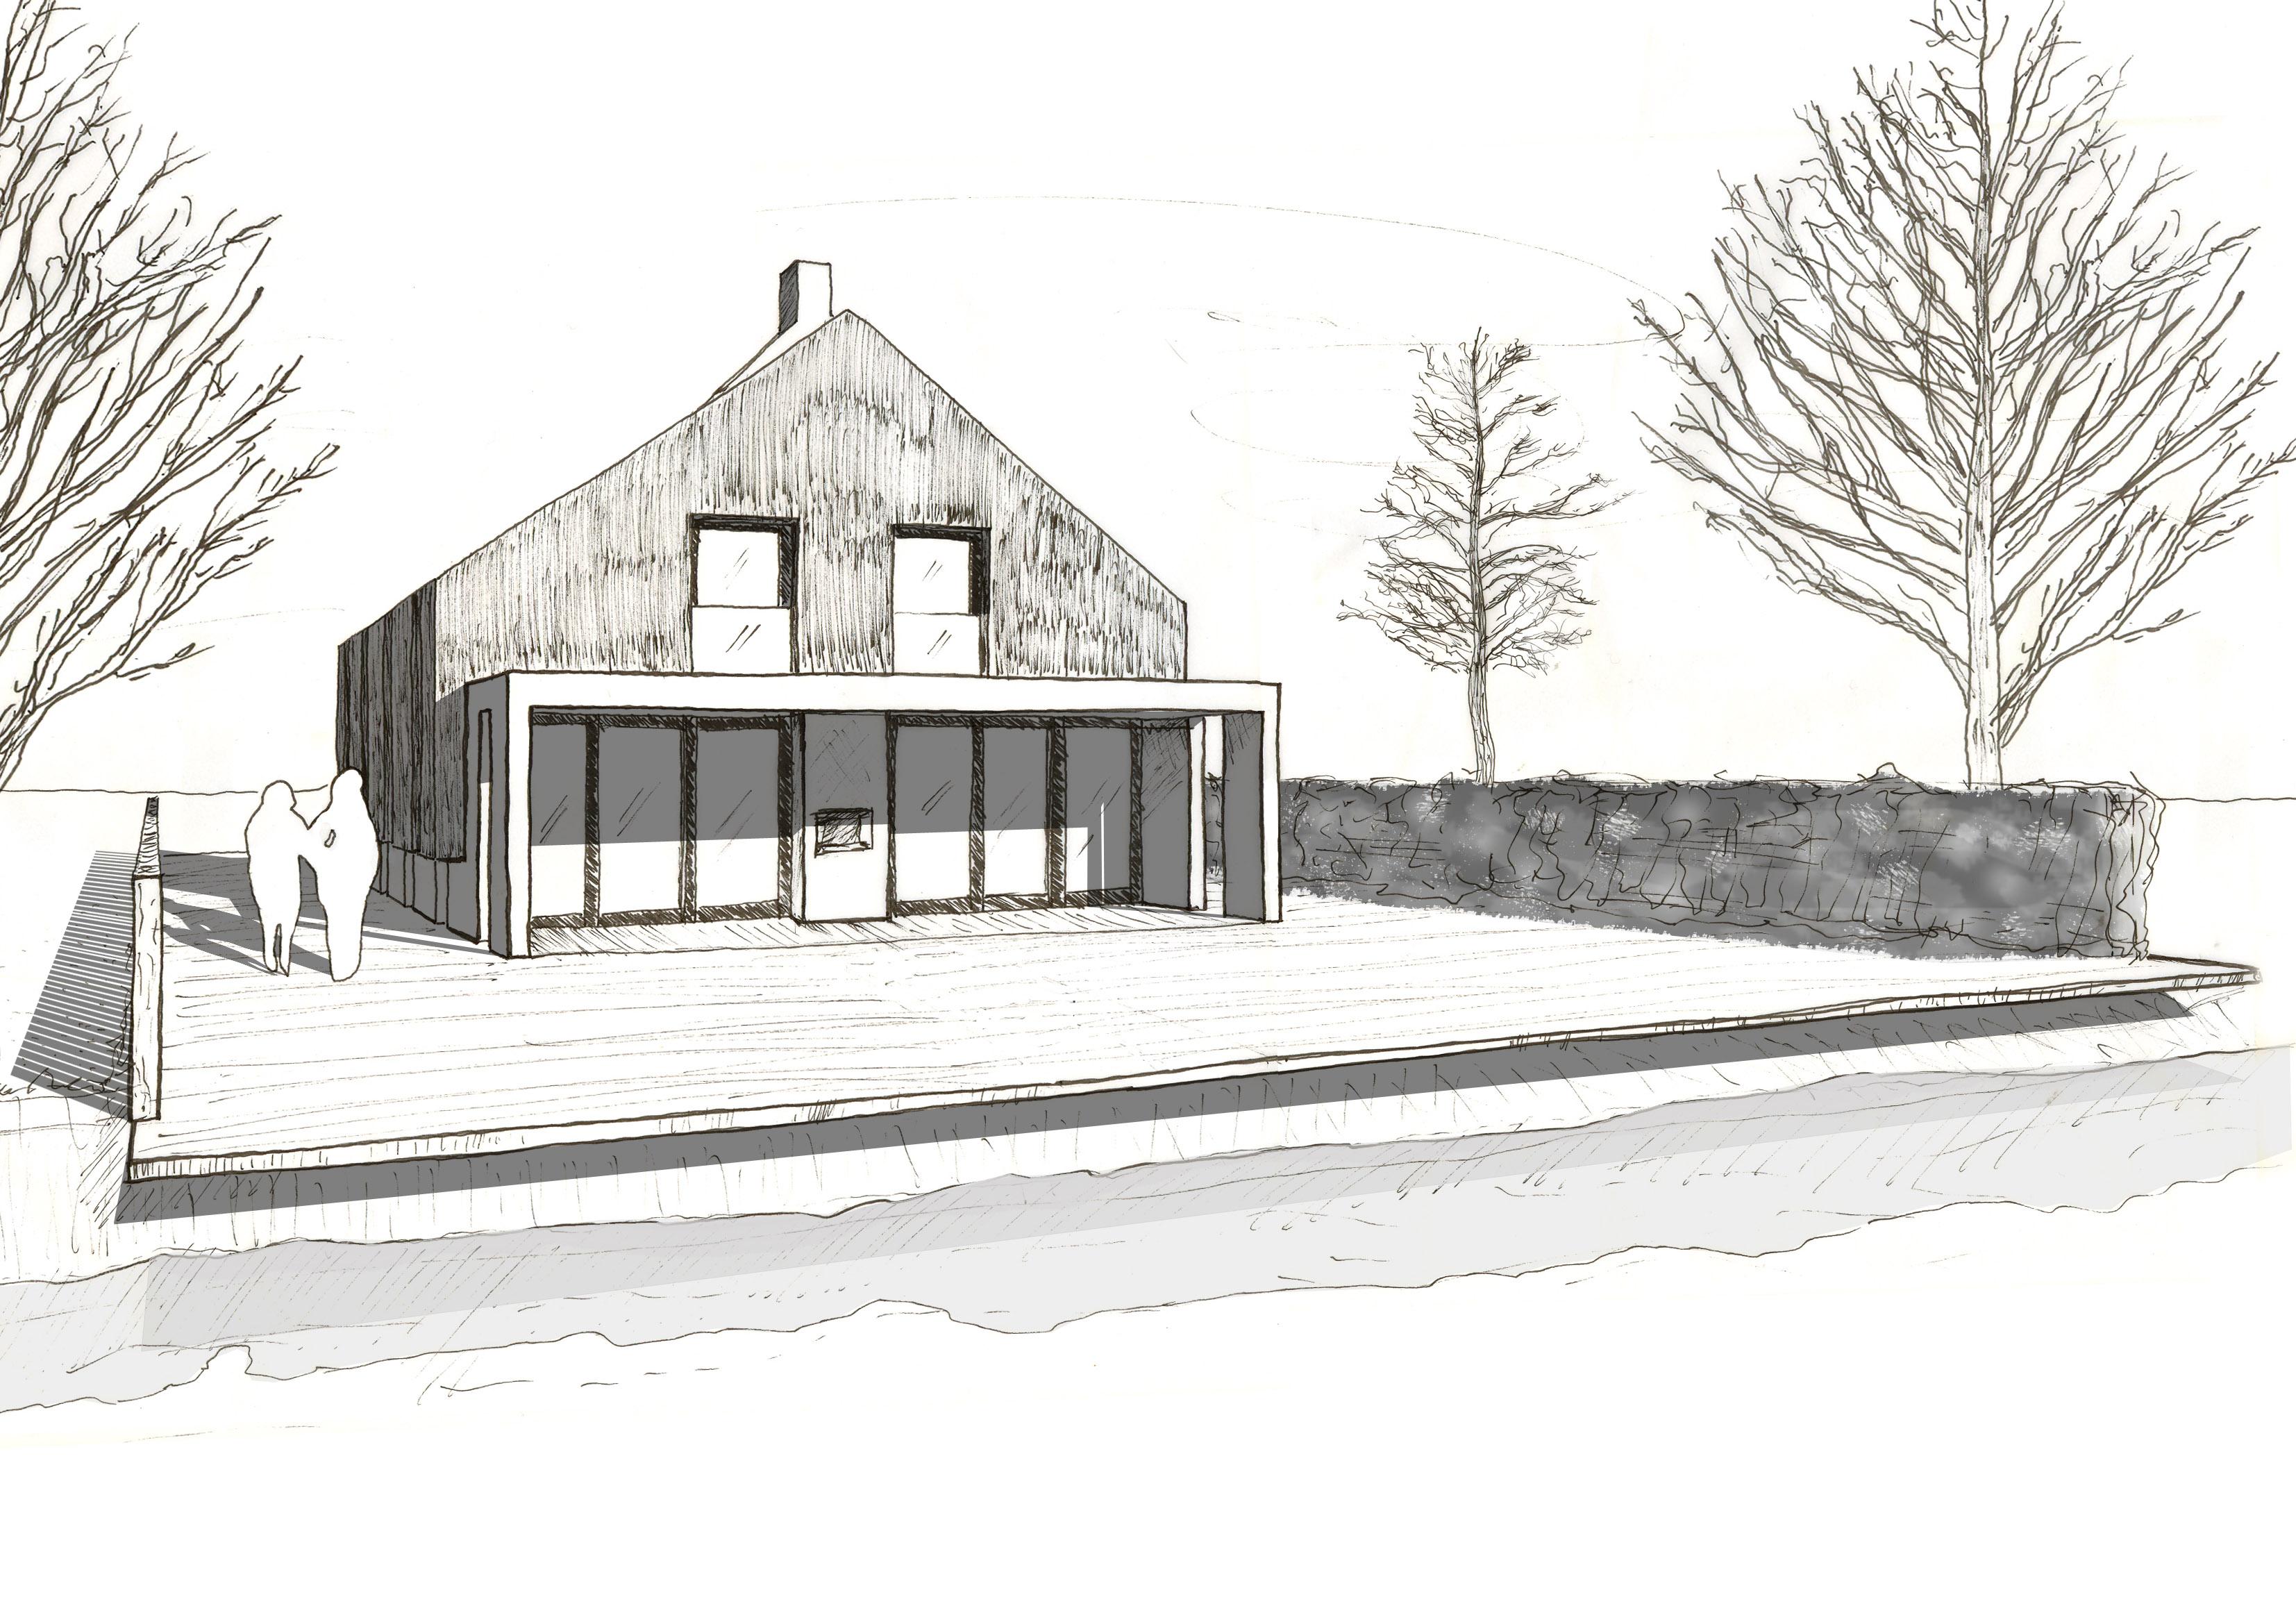 Archi In Casa Moderna living on the edge | arjen reas